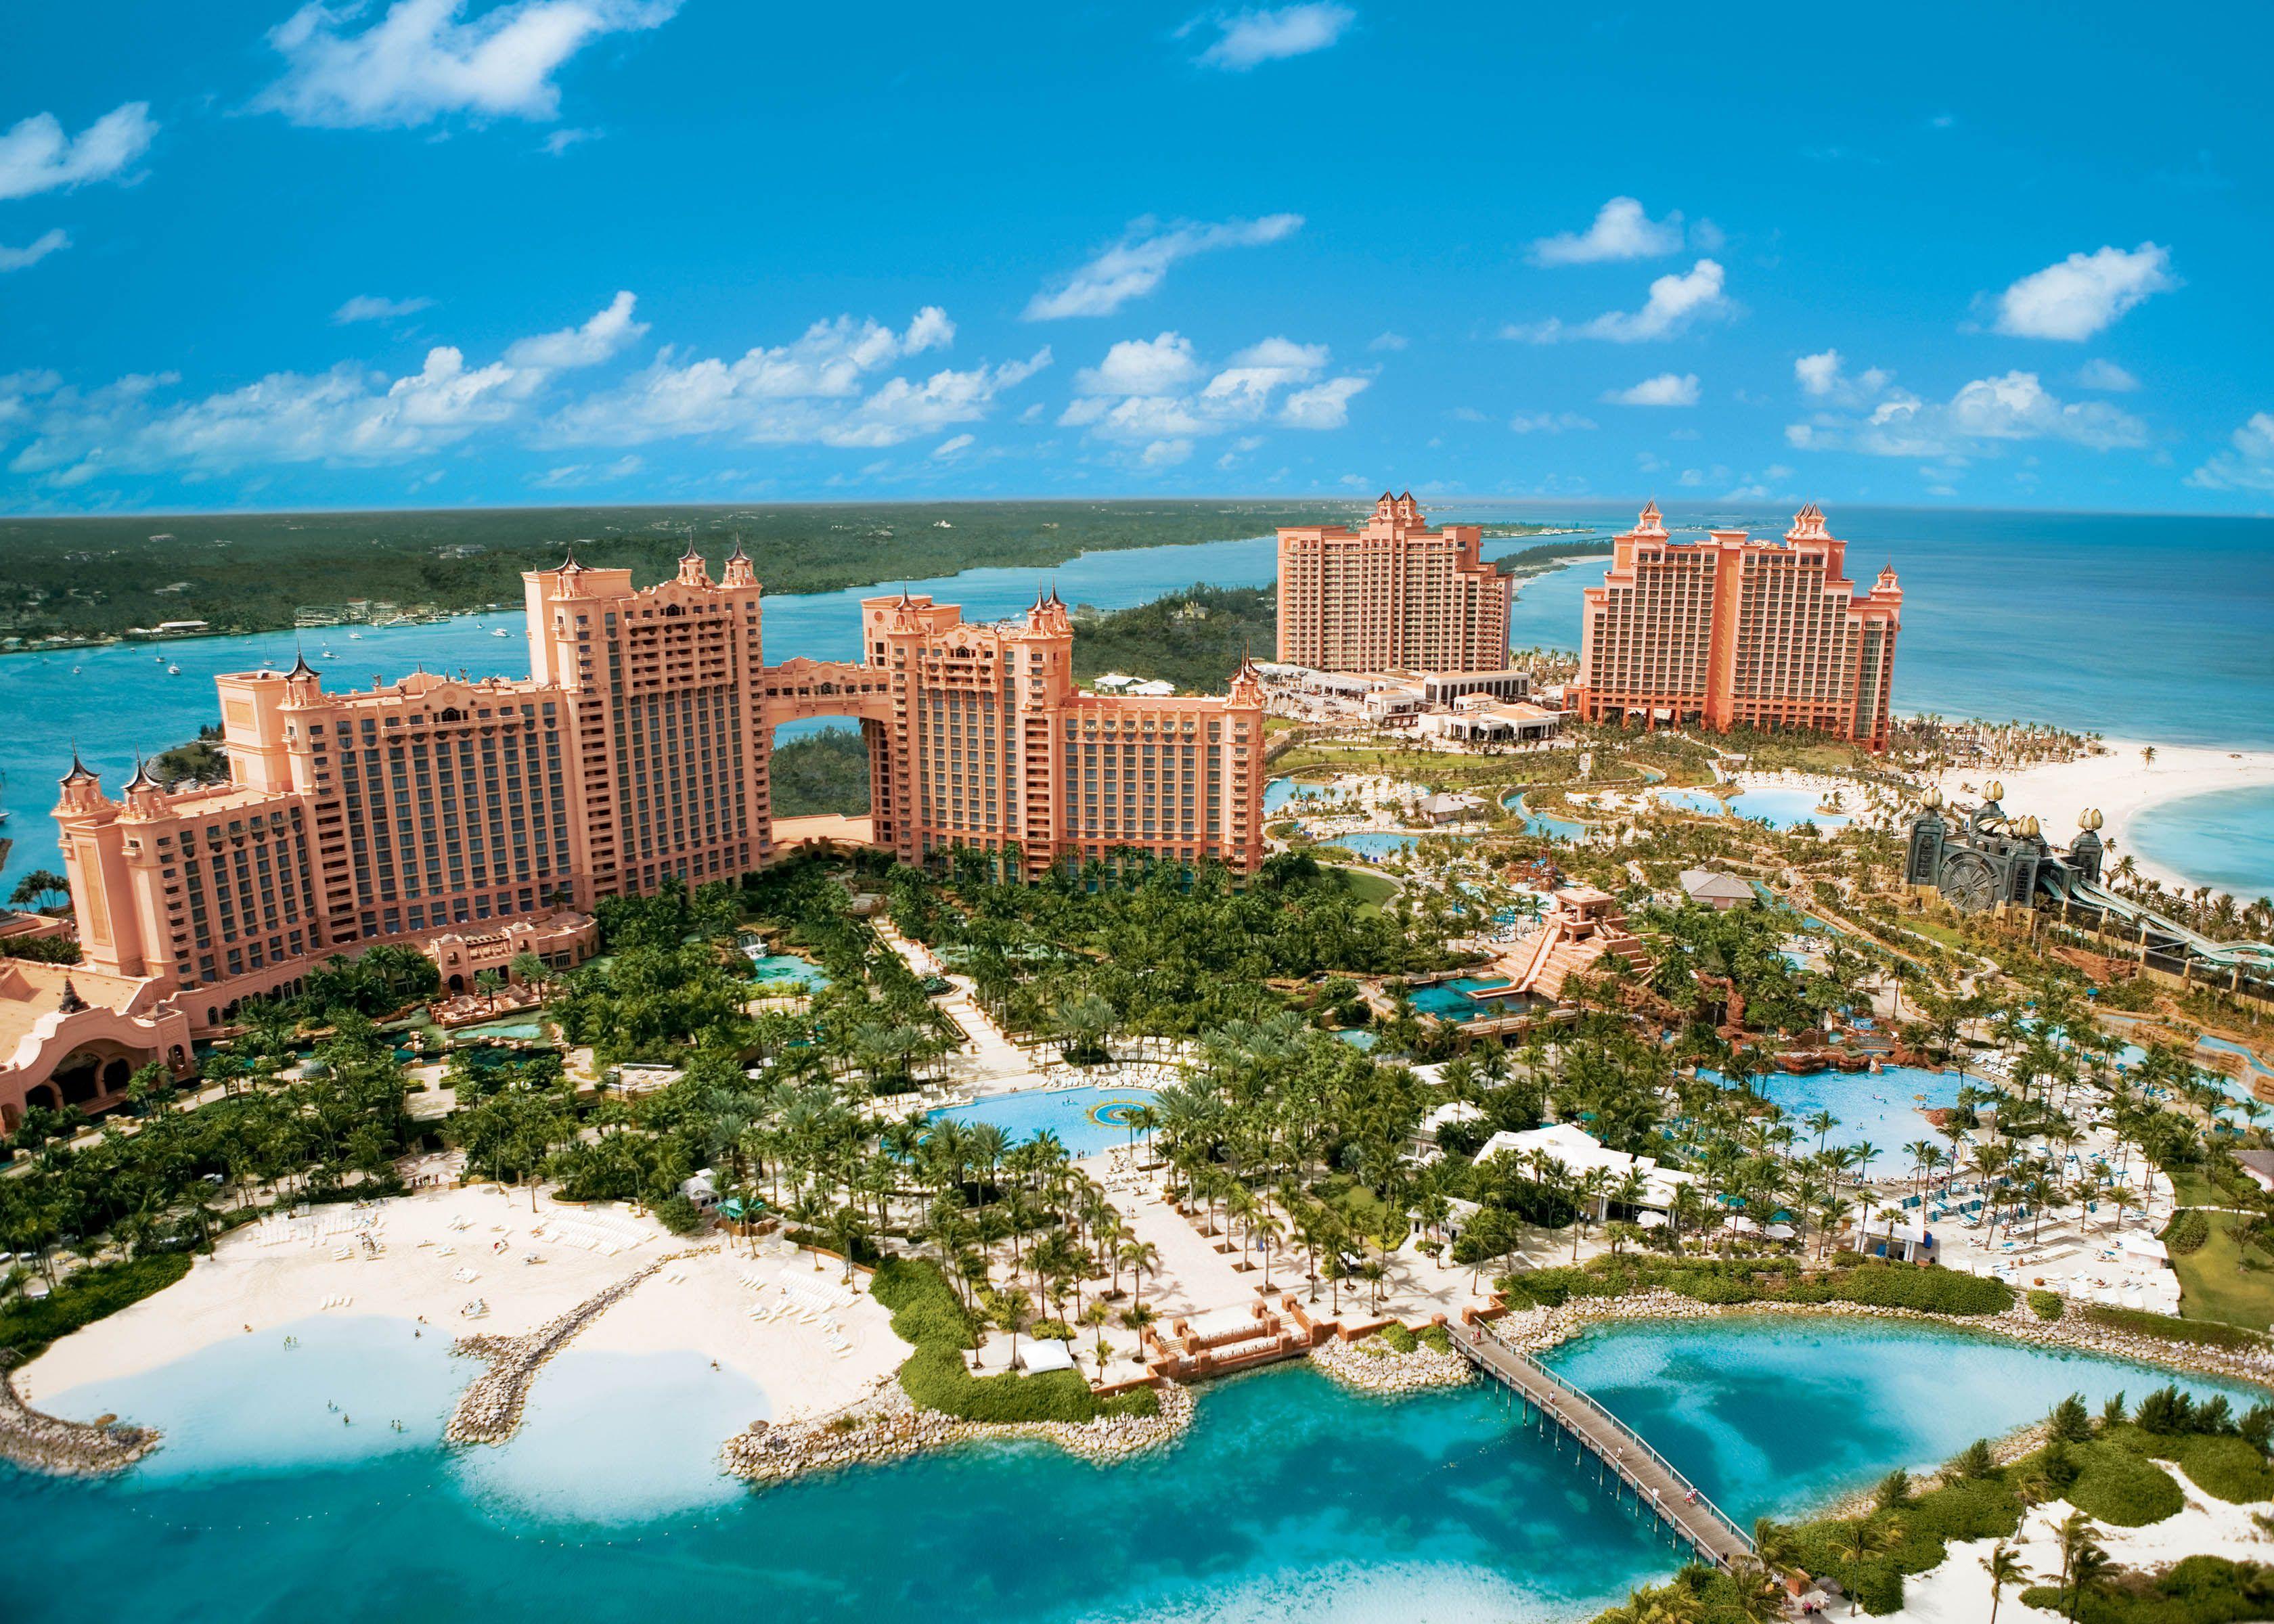 Aerial view of the Atlantis Paradise Island  Atlantis